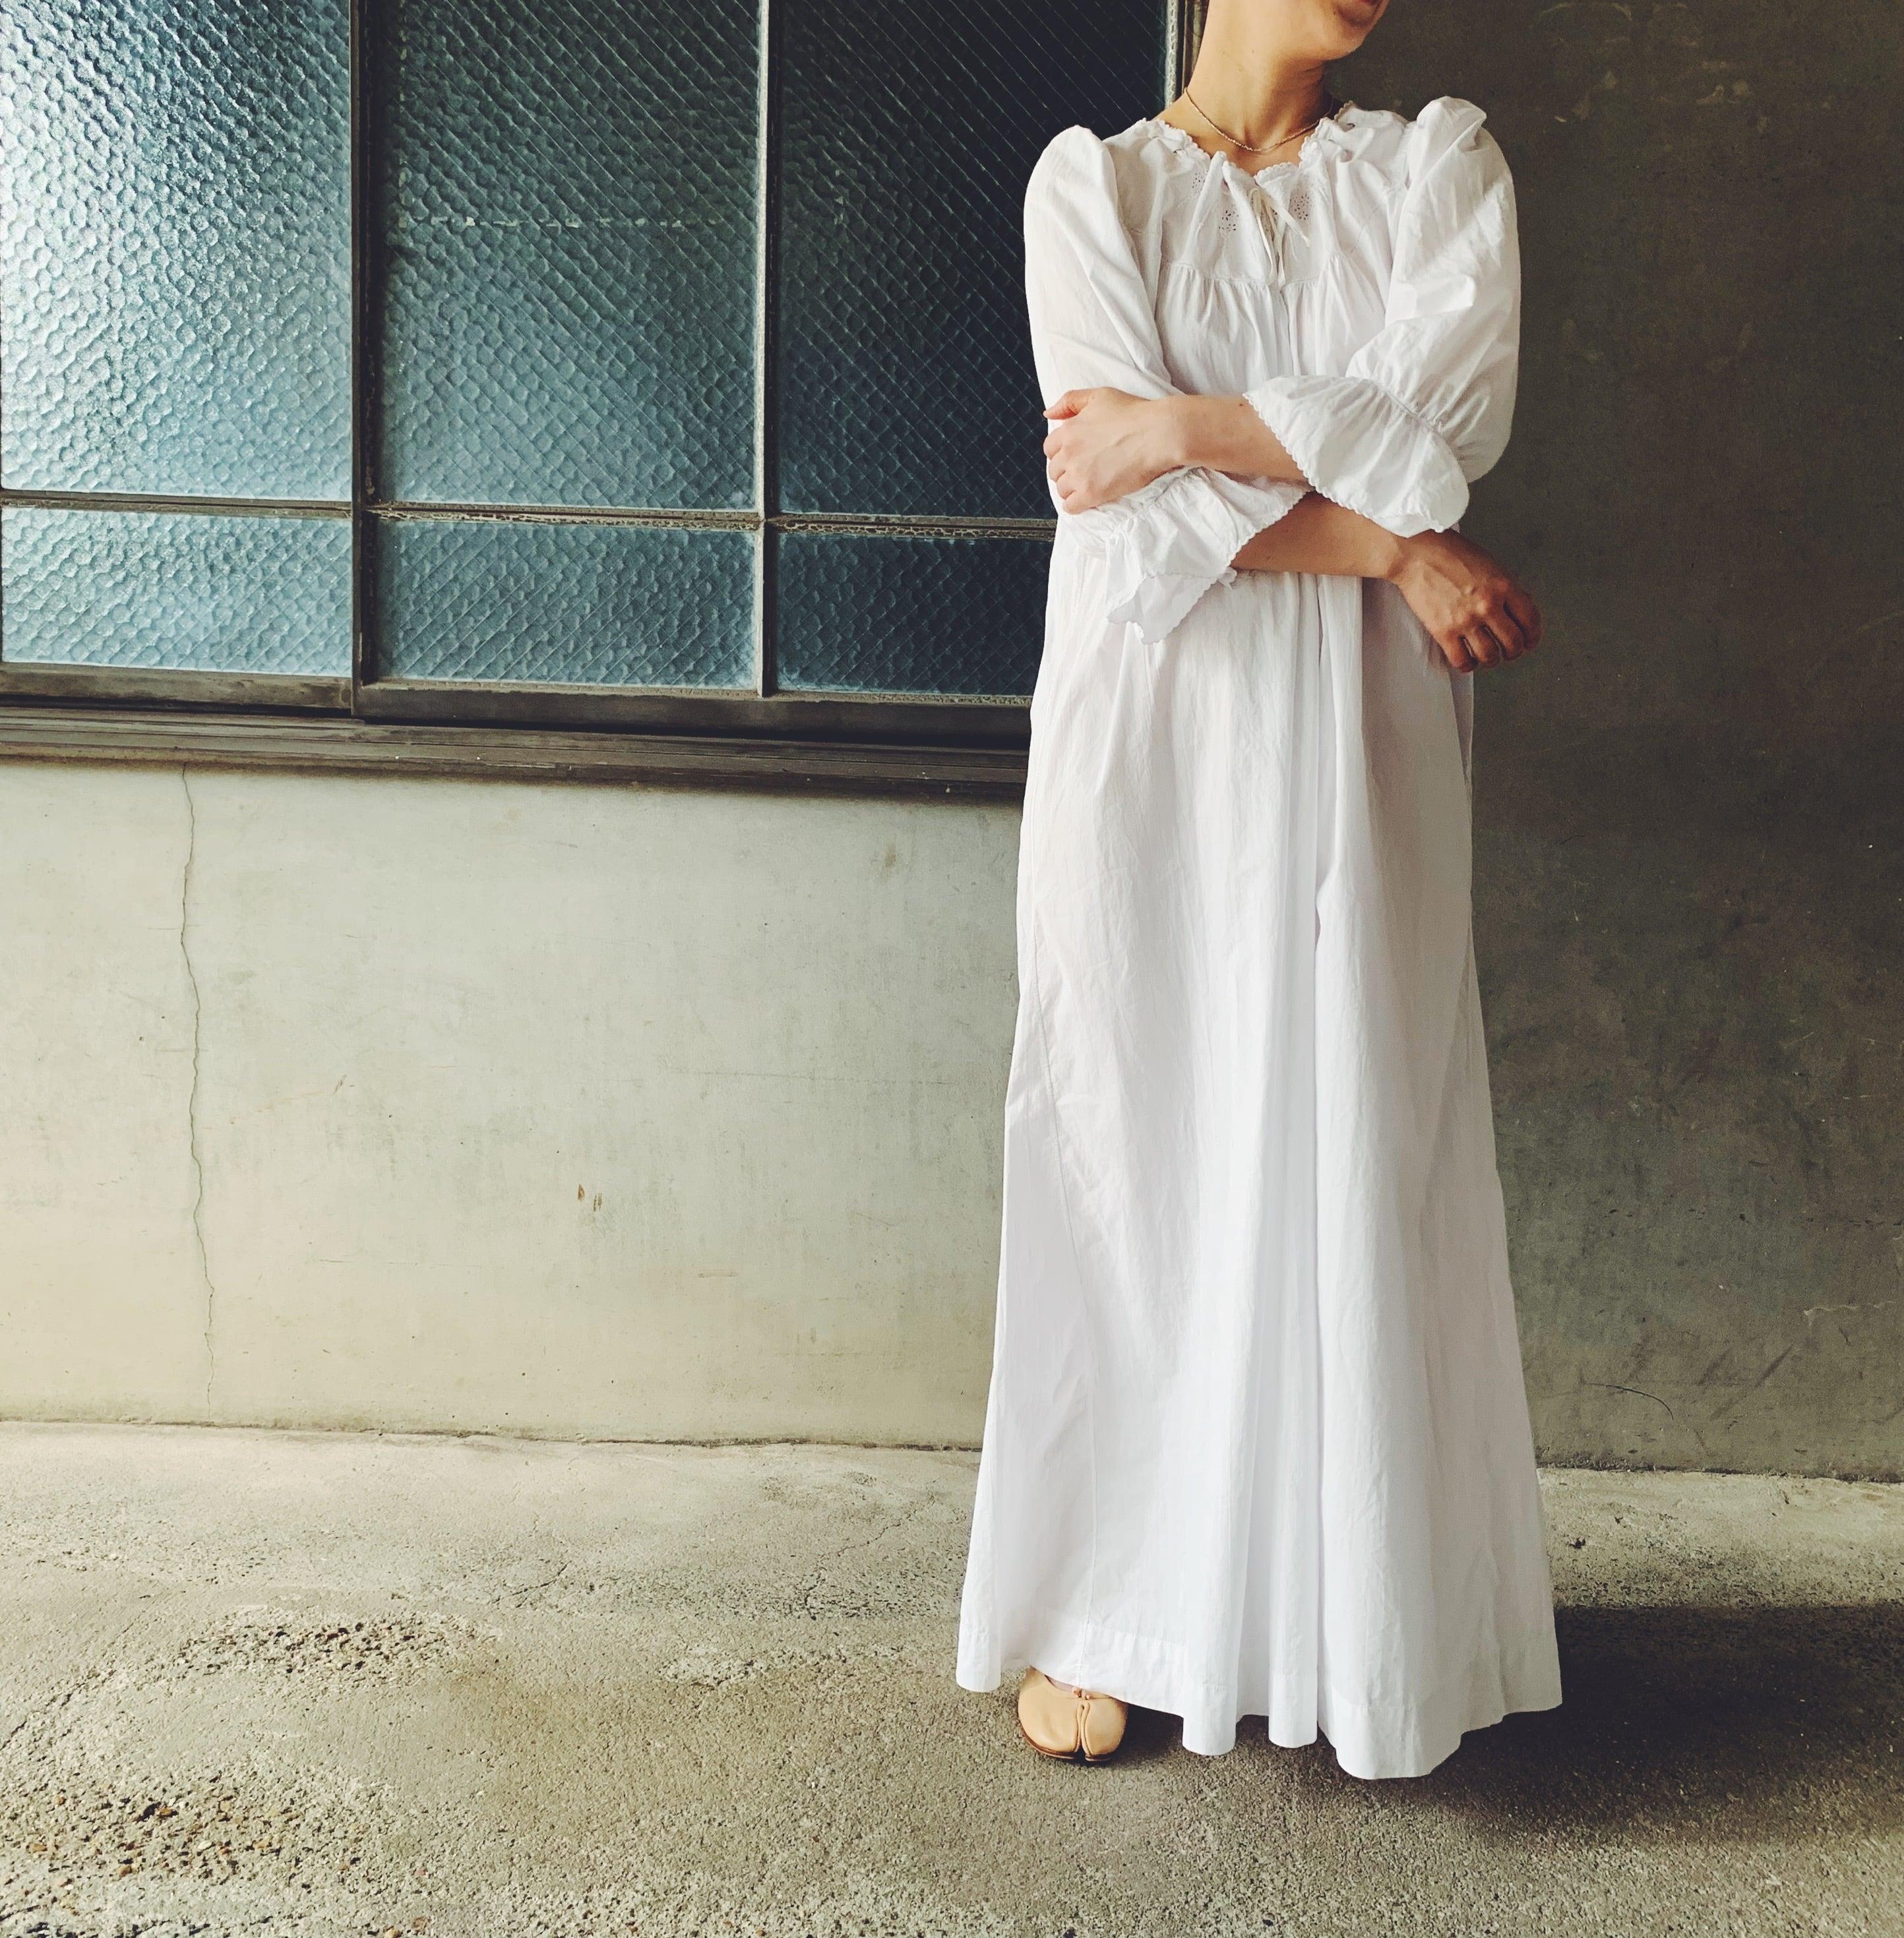 French nightdress (A01-21-30)